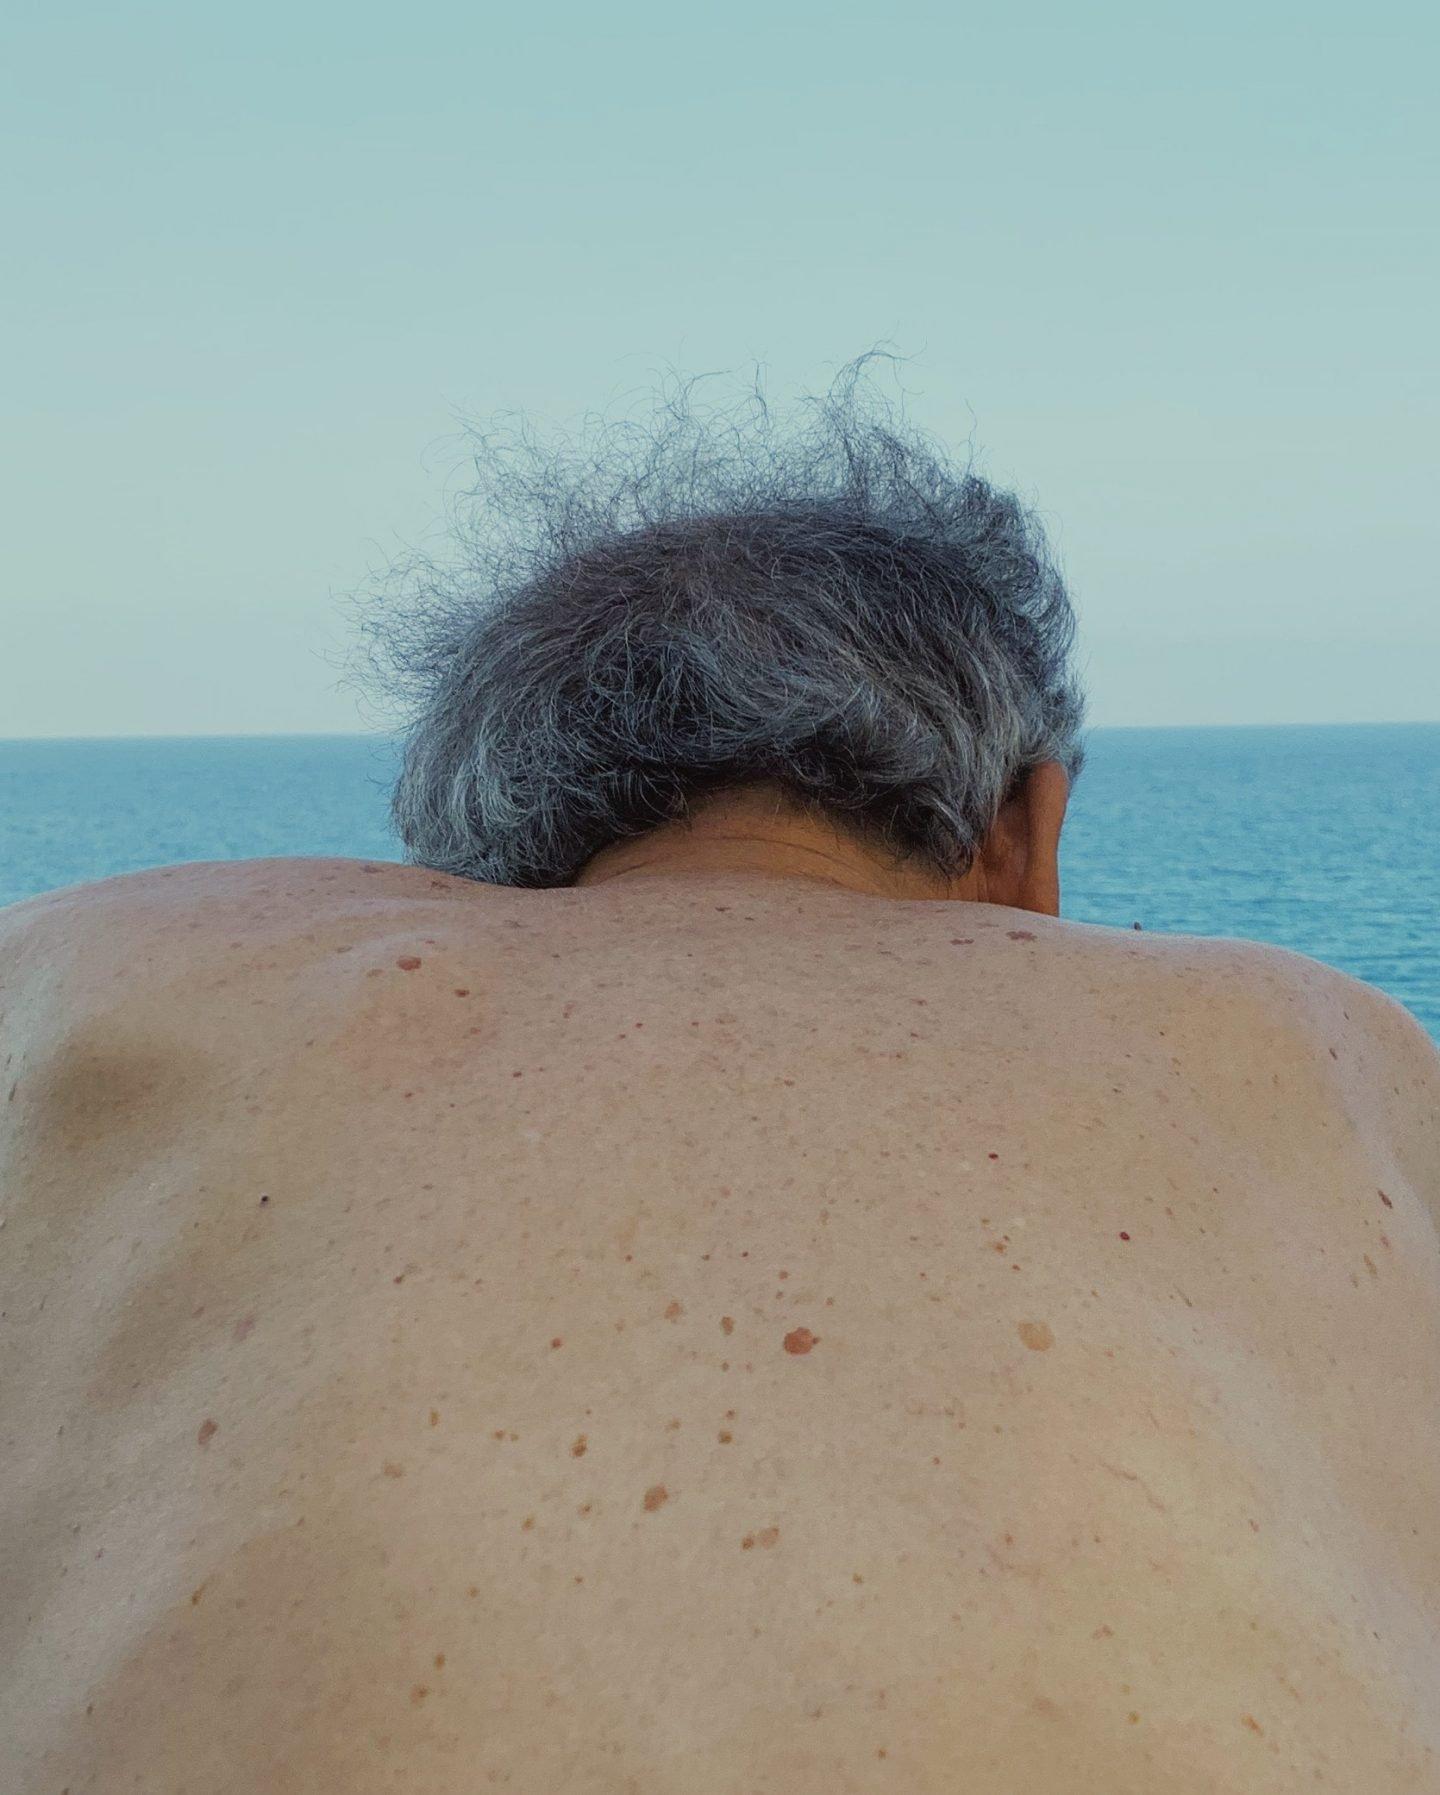 IGNANT-Photography-Leandro-Colantoni-06-min